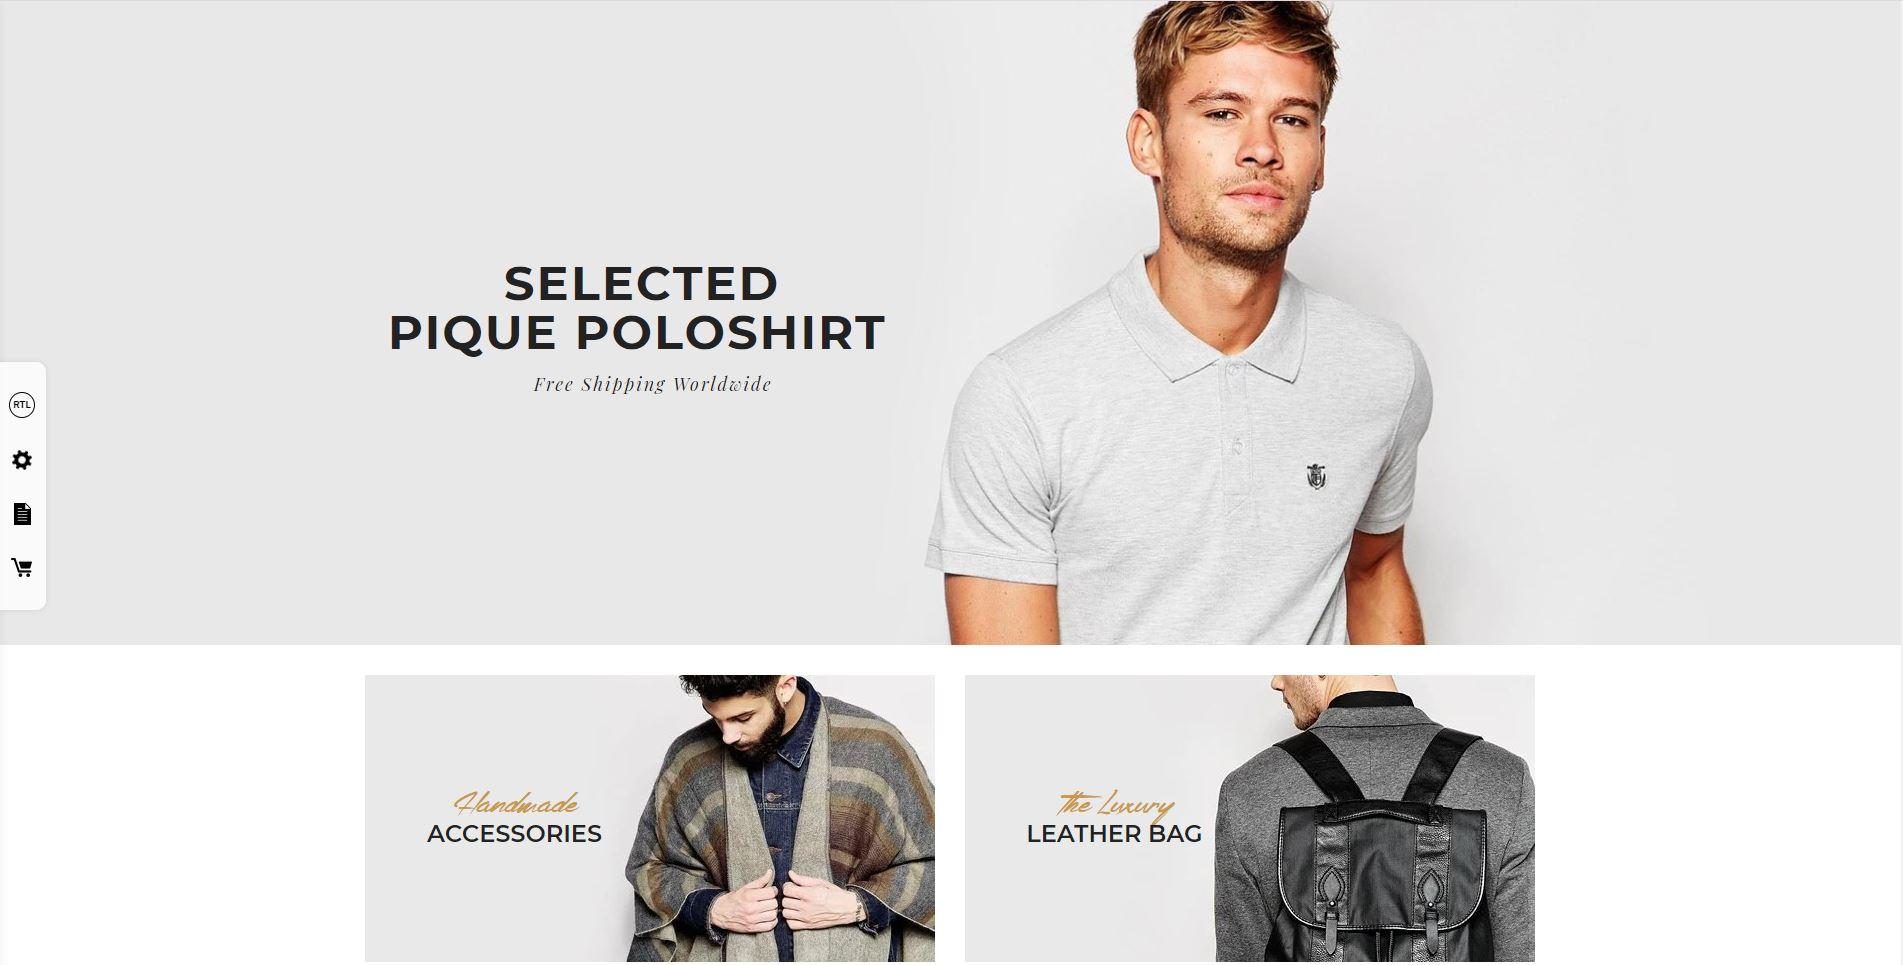 Boutique Fashion WooComerce themes